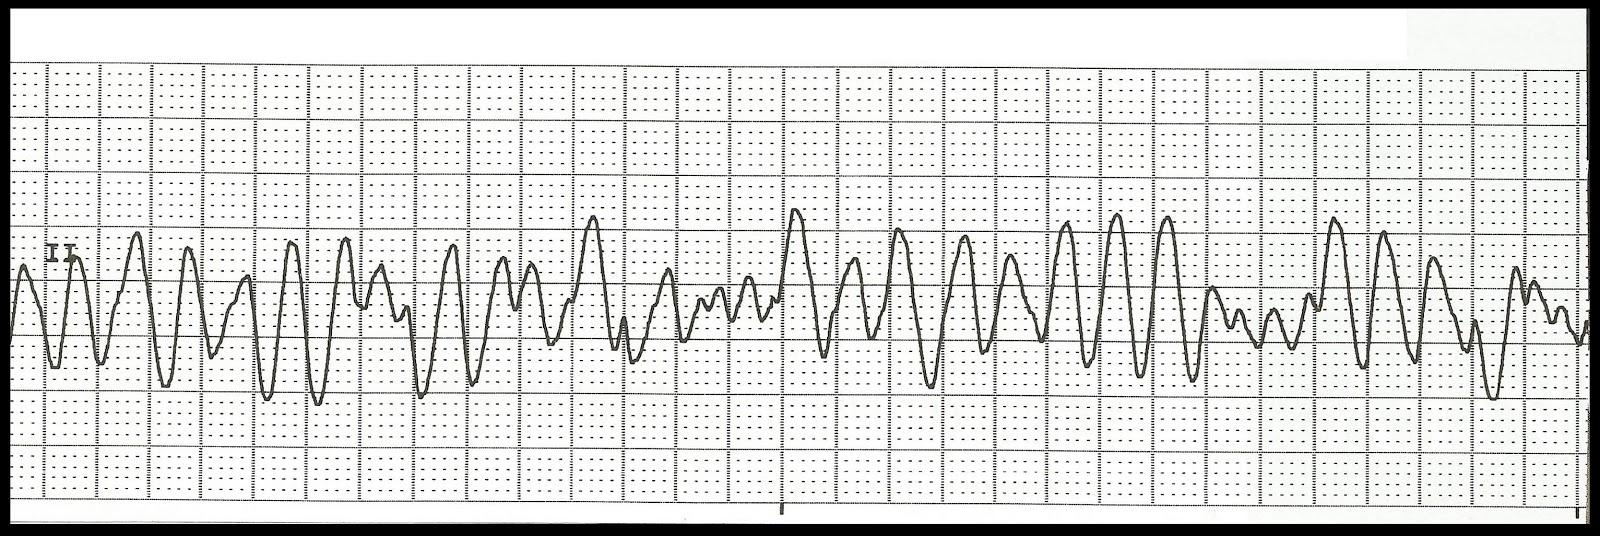 how to read cardiac strips